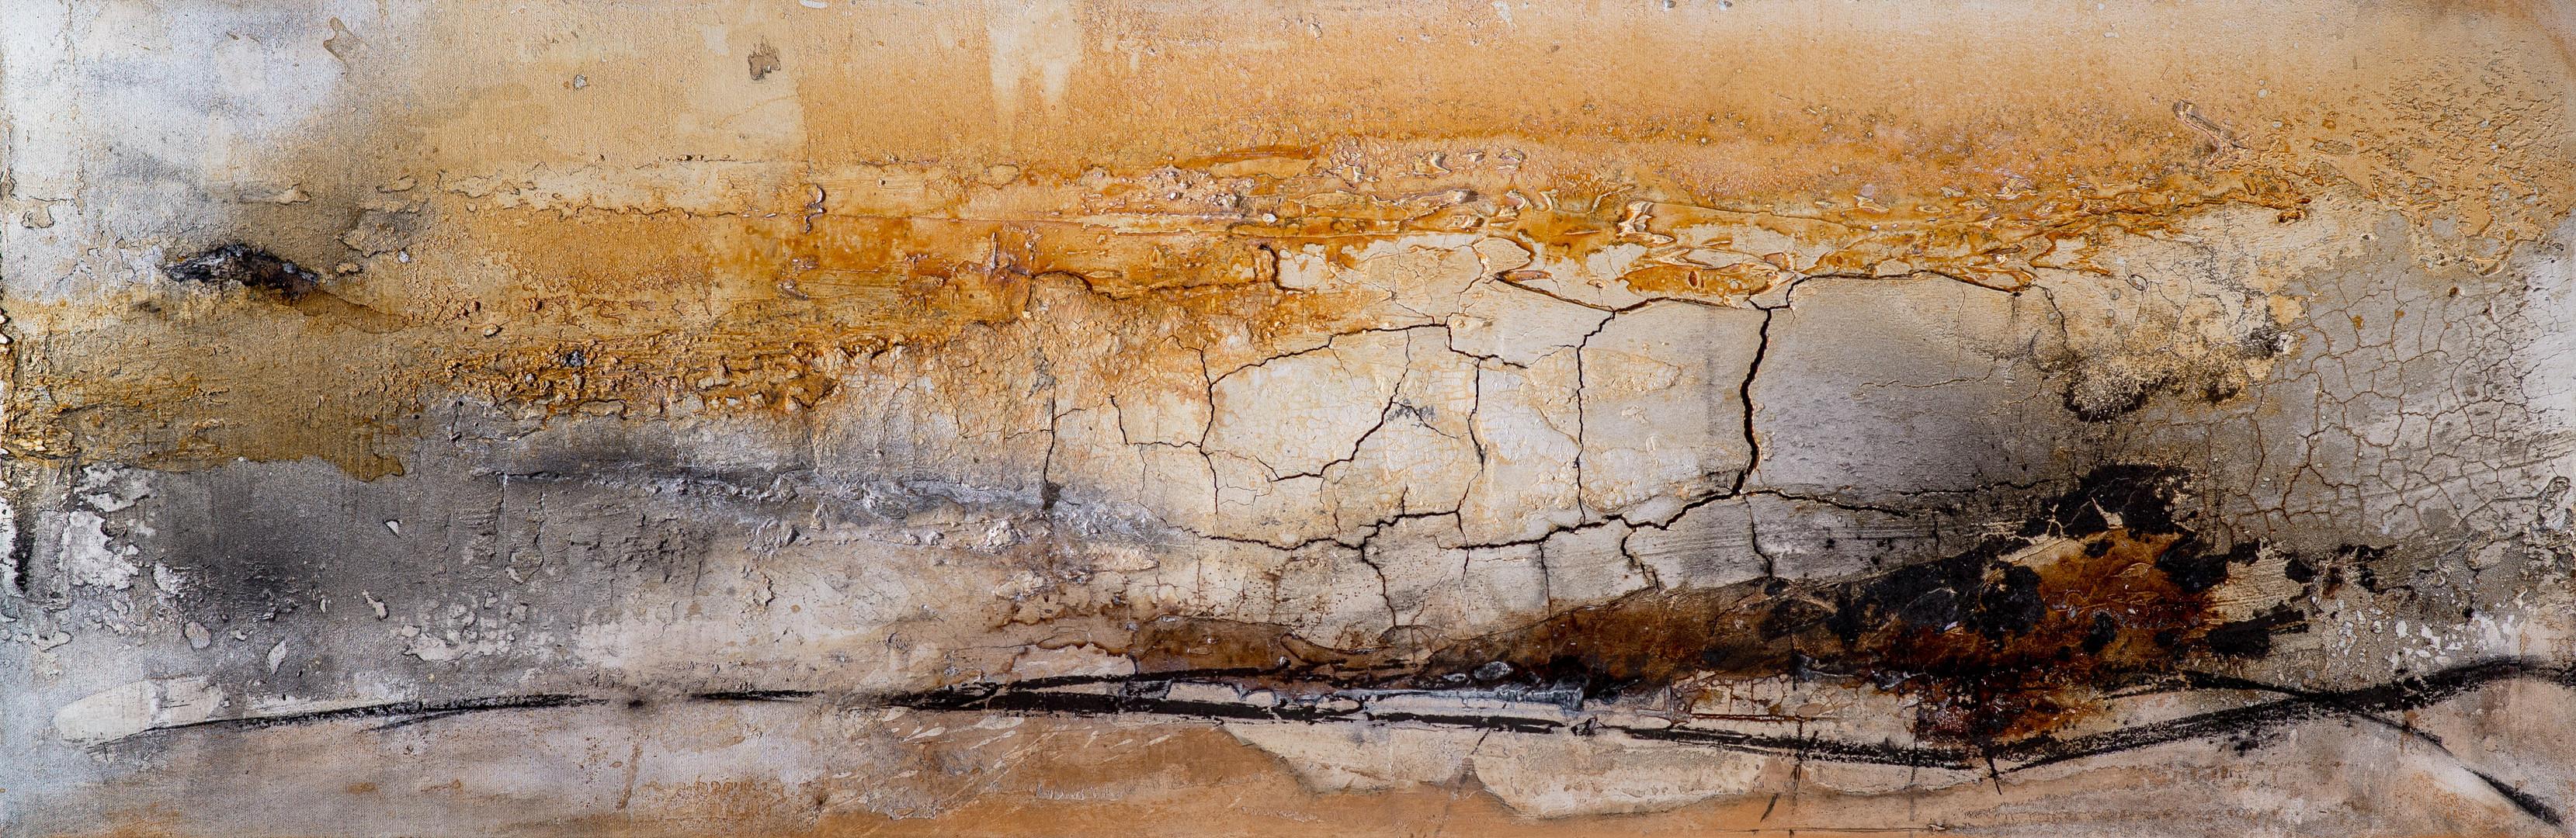 Wüste, 150x50 cm